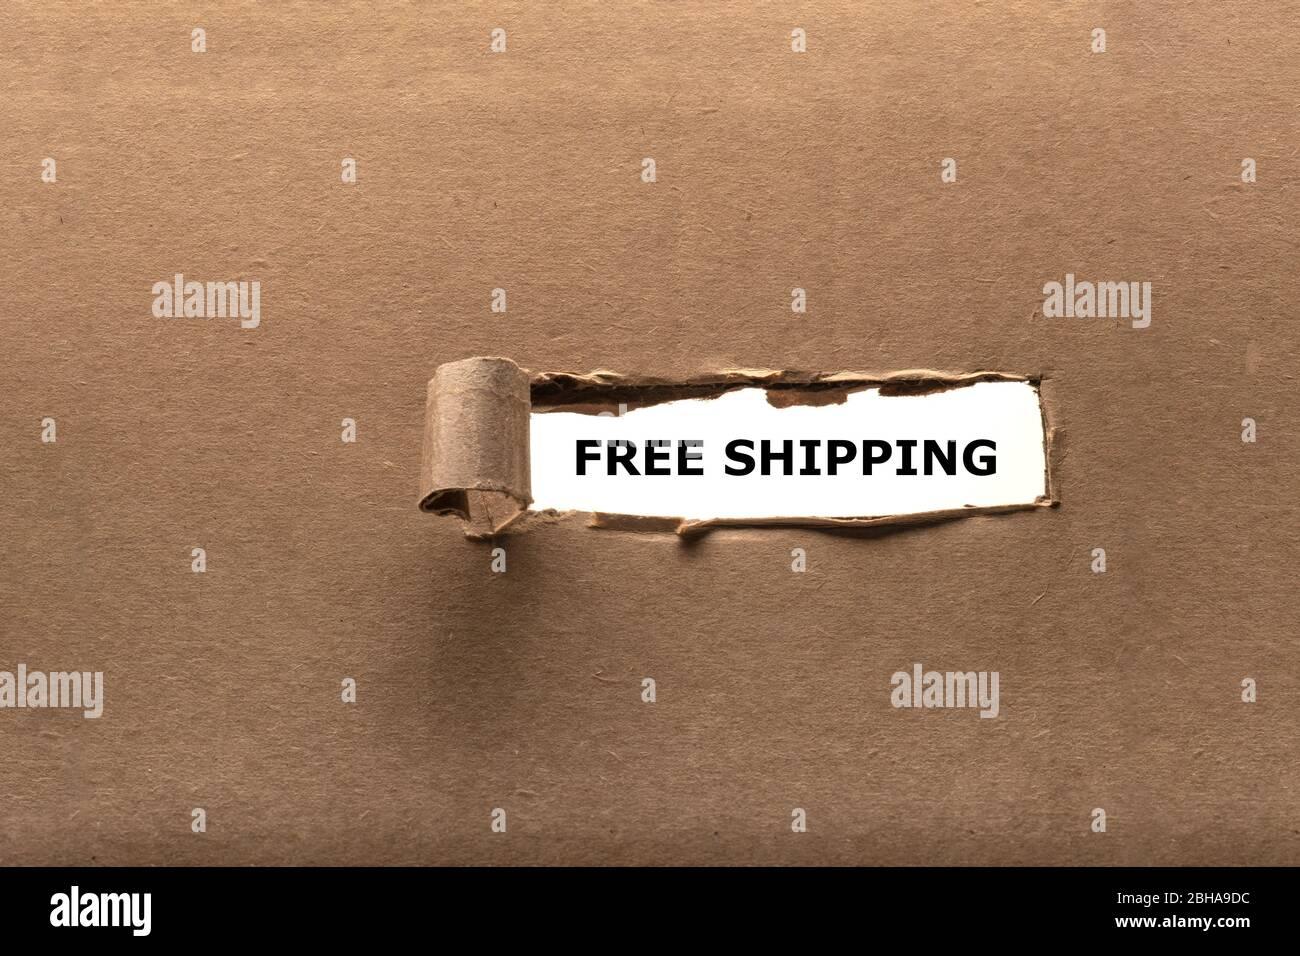 Papel roto revelando mensaje de envío gratuito Foto de stock